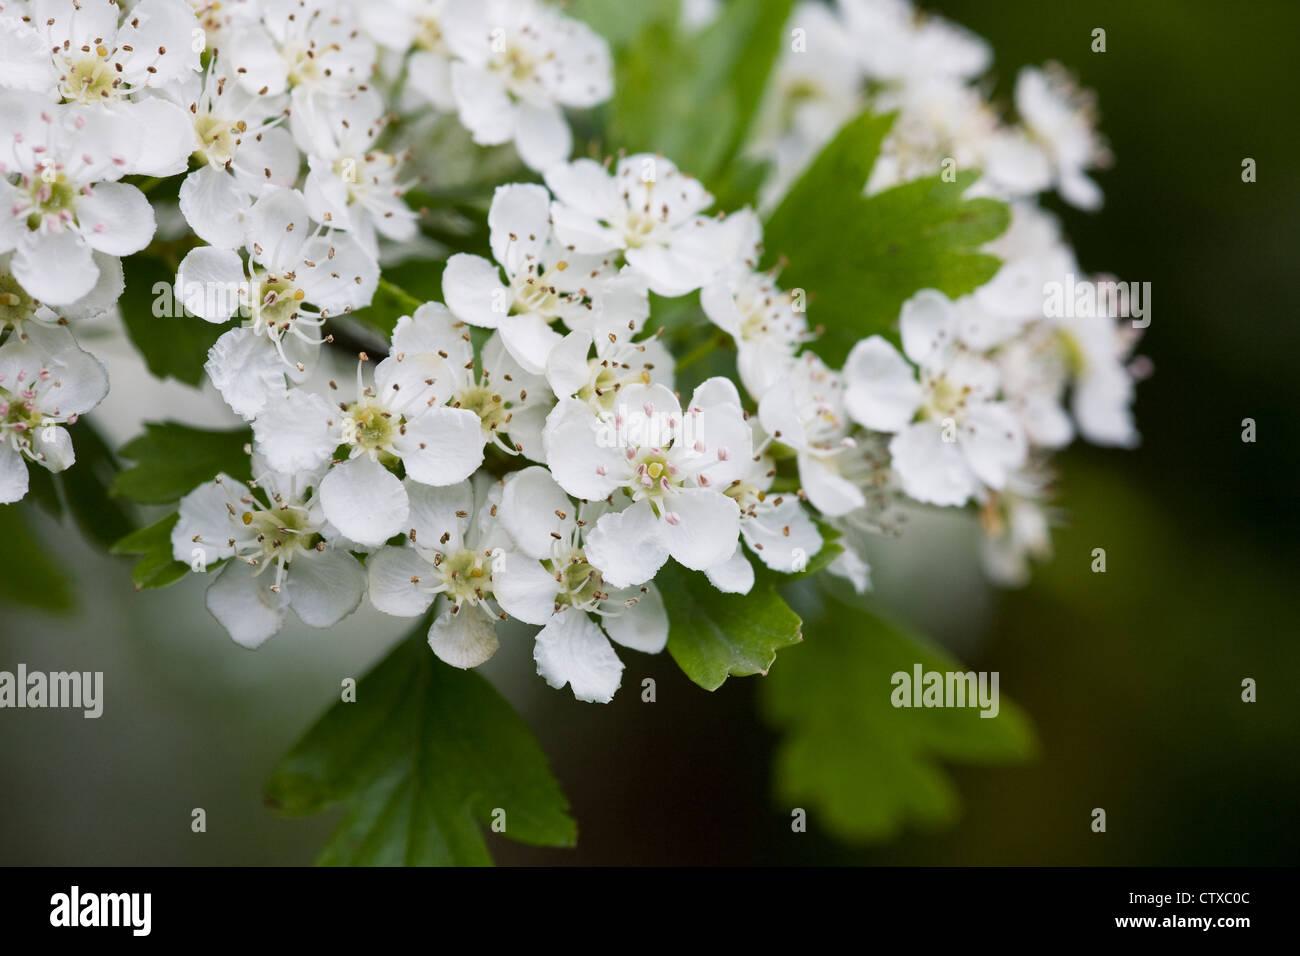 Crataegus monogyna blossom. Hawthorn blossom in Spring. - Stock Image